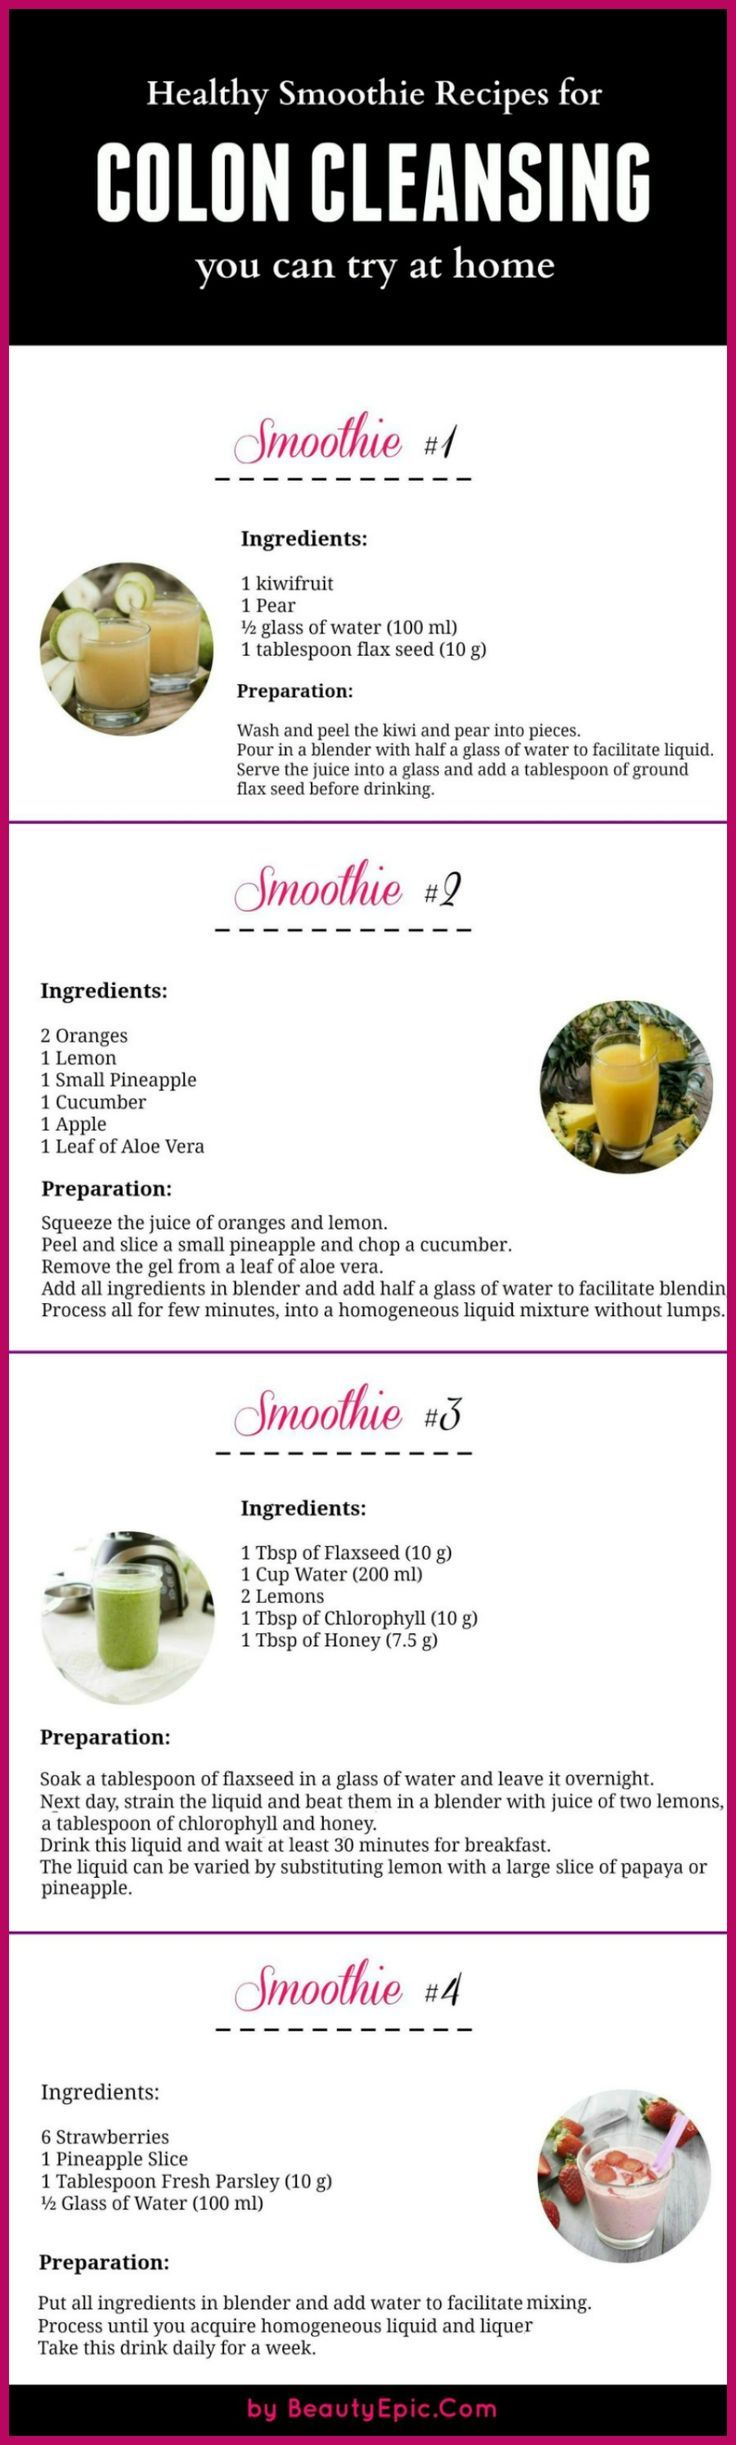 Grapefruit Detox Smoothie